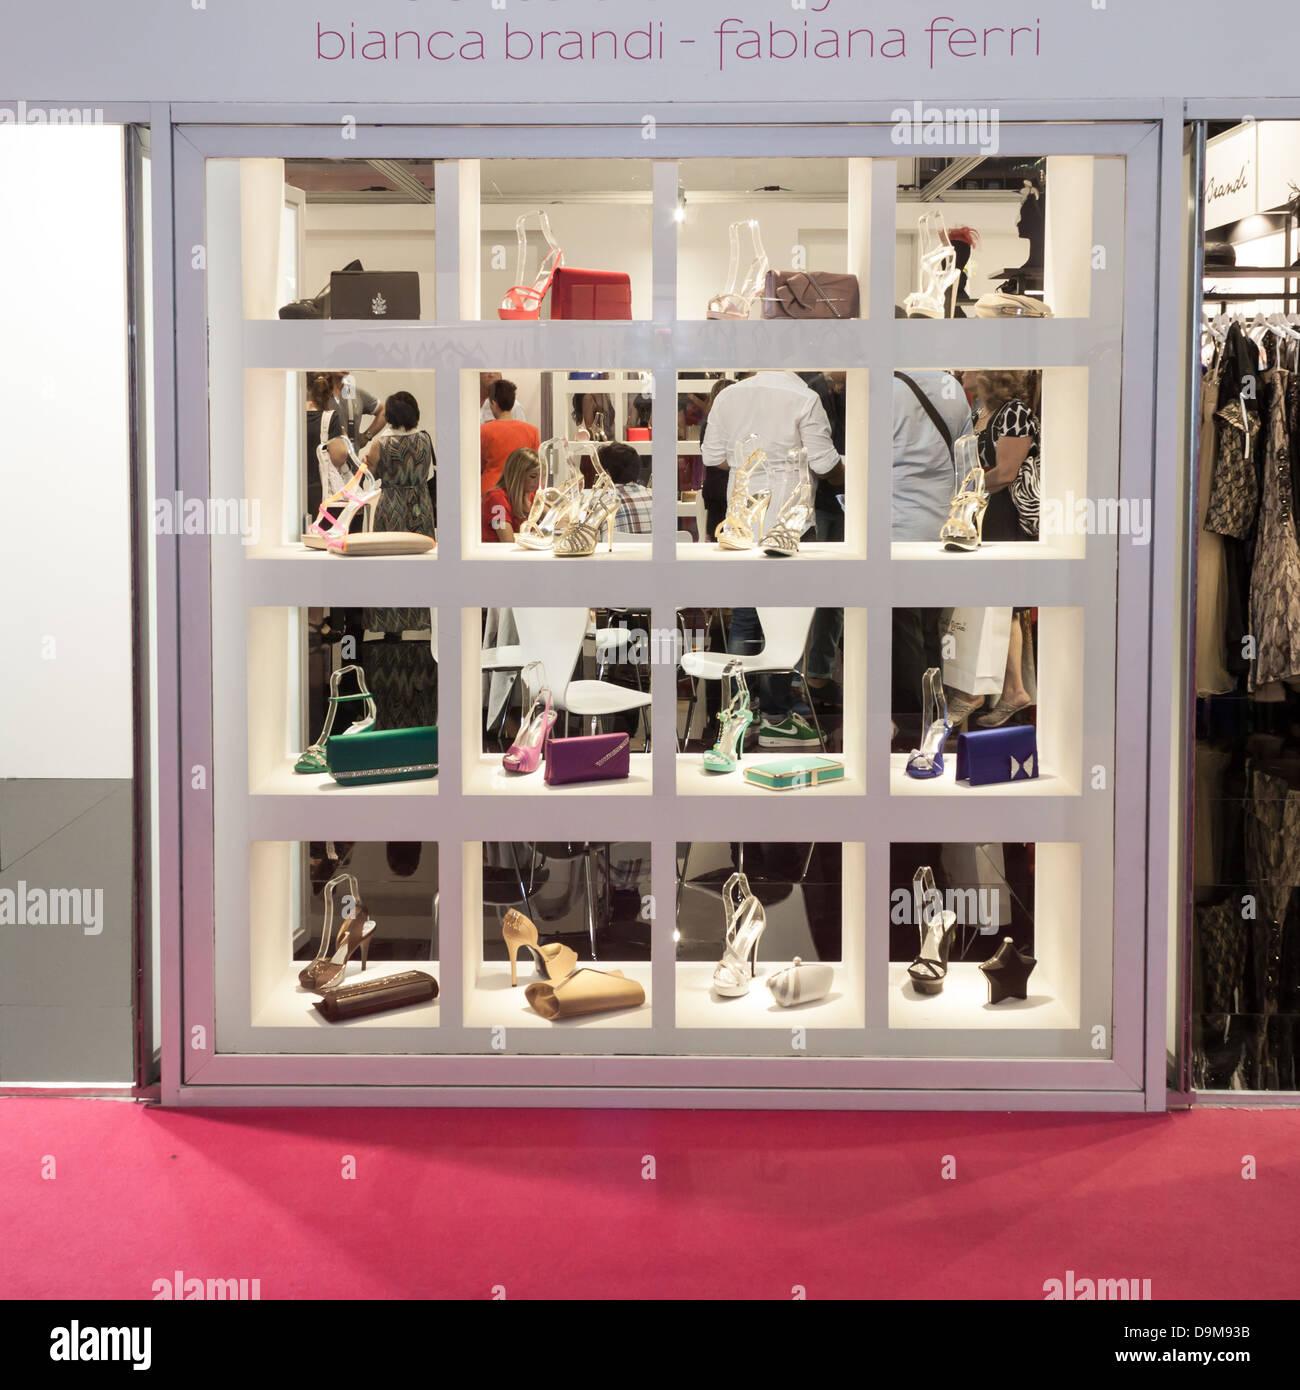 Milan, Italy - June 21, 2013: People visit SposaItalia, international exhibition of bridal and formal wear in Milan. - Stock Image